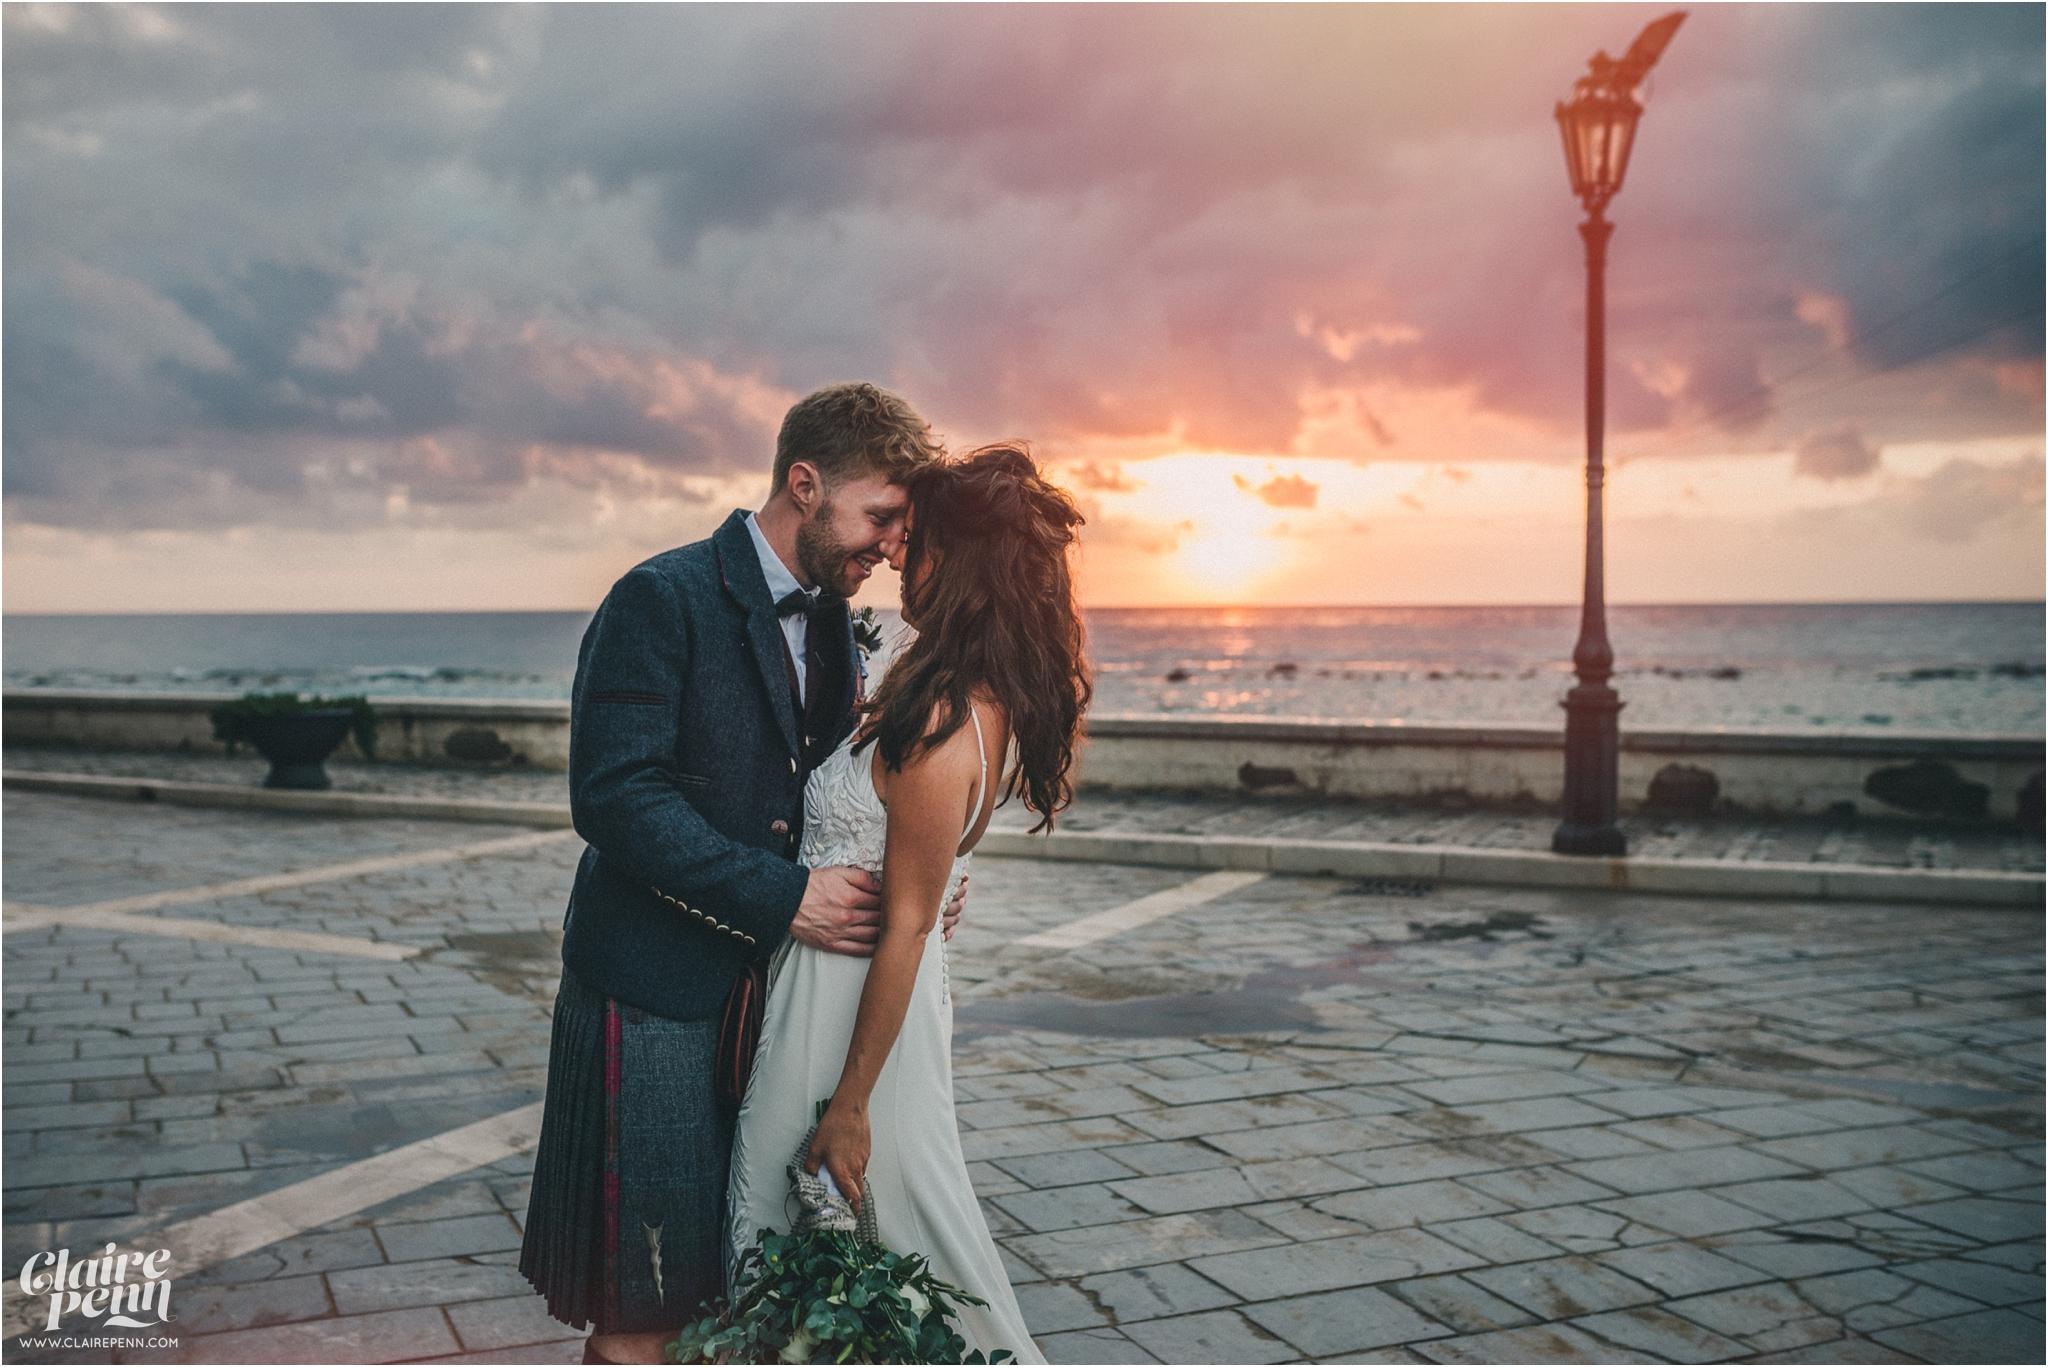 Destination wedding Santa Maria di Castellabate Italy_0047.jpg